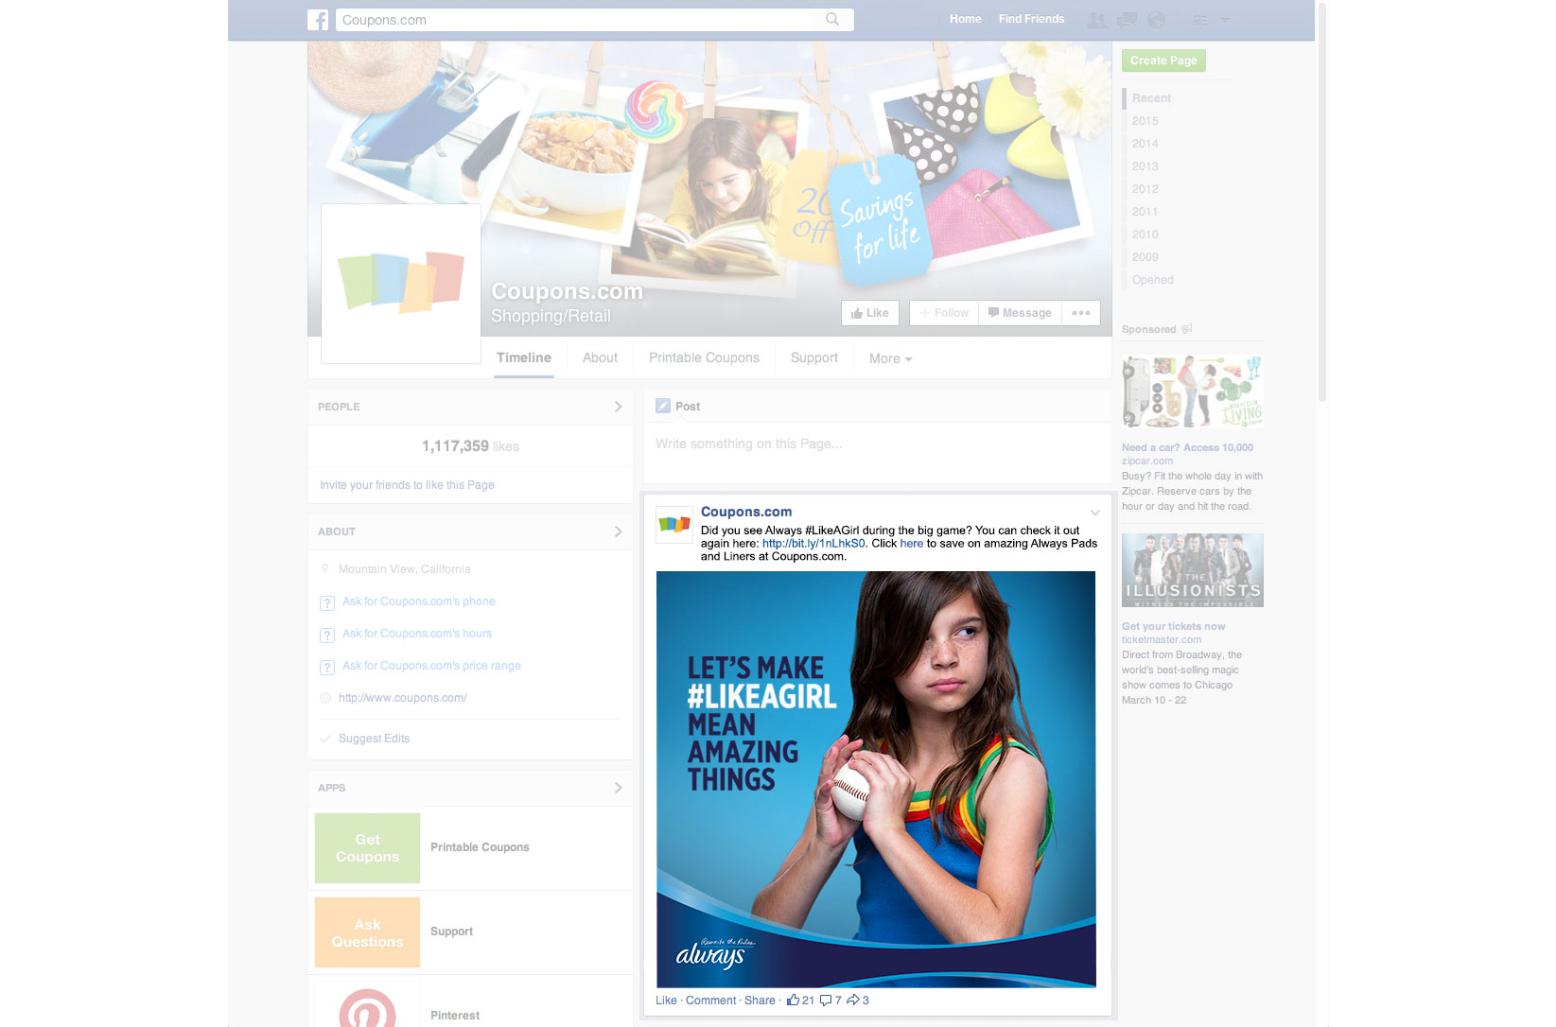 Coupons.com Facebook Post